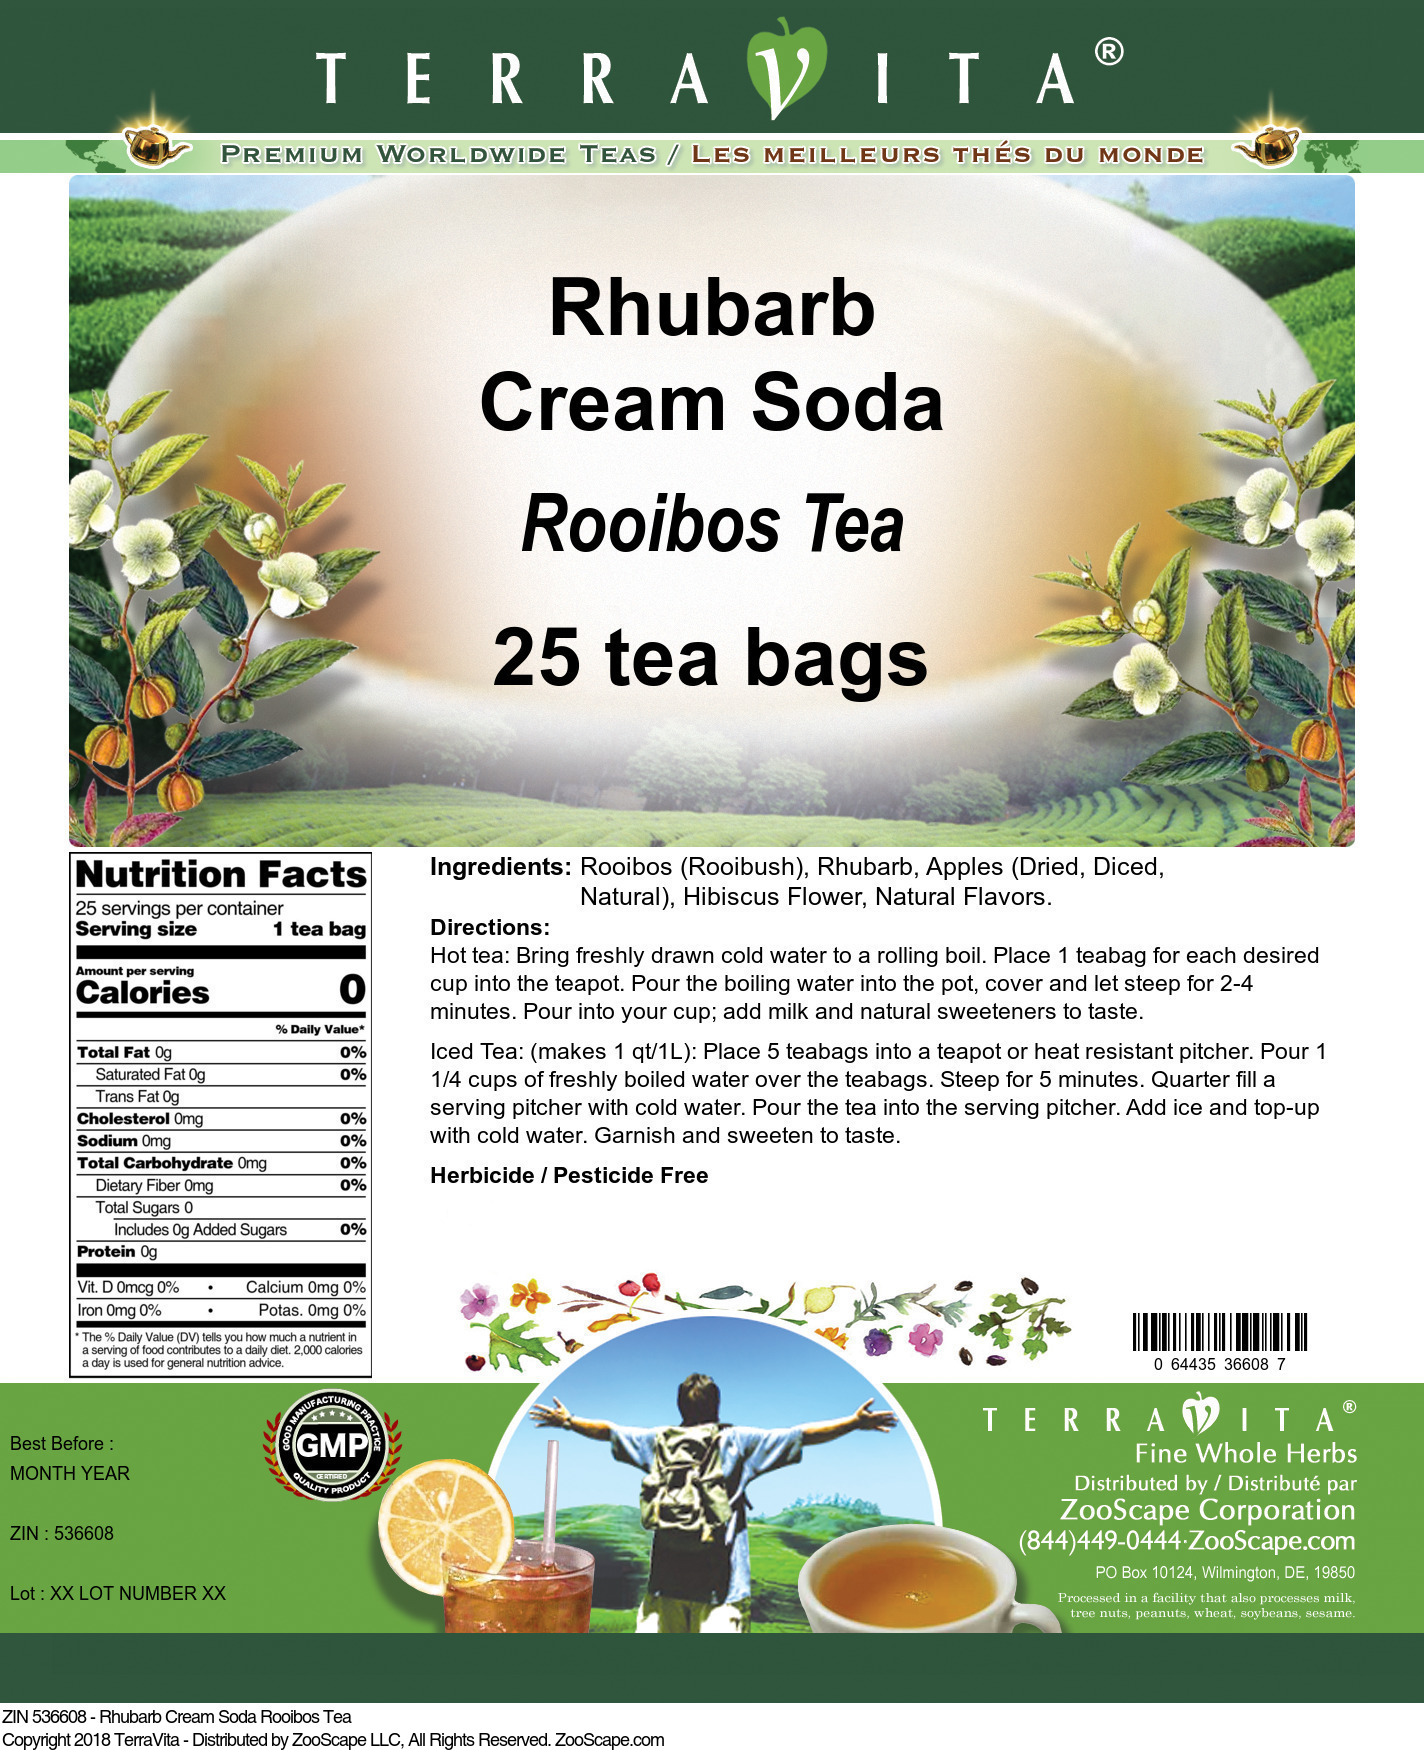 Rhubarb Cream Soda Rooibos Tea